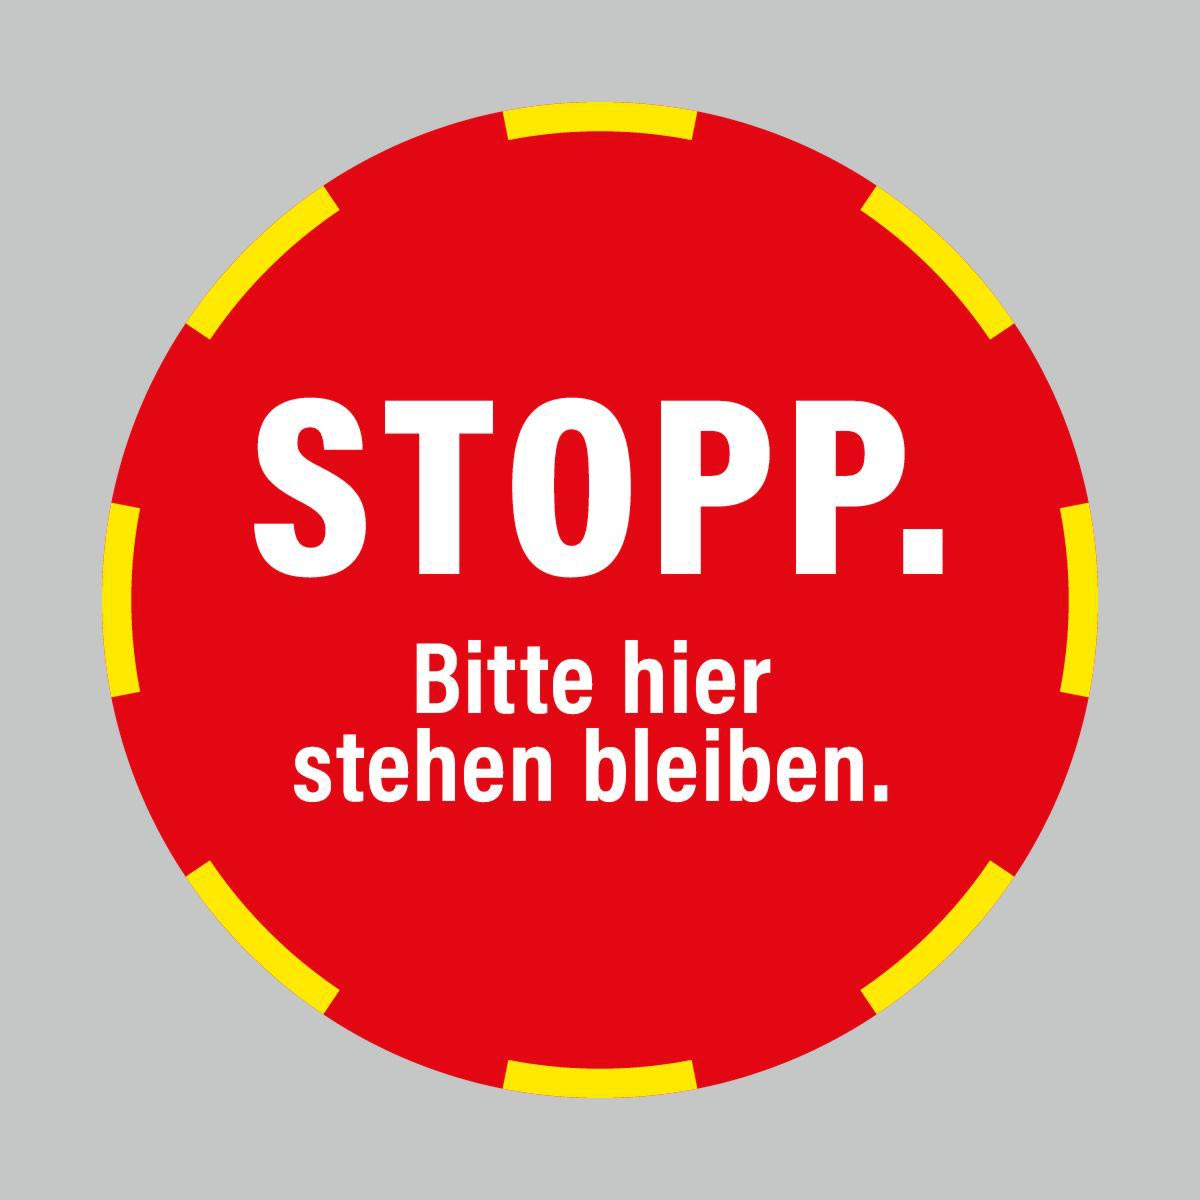 Fußbodenaufkleber, weiß-rot, Ø 48cm – Stopp